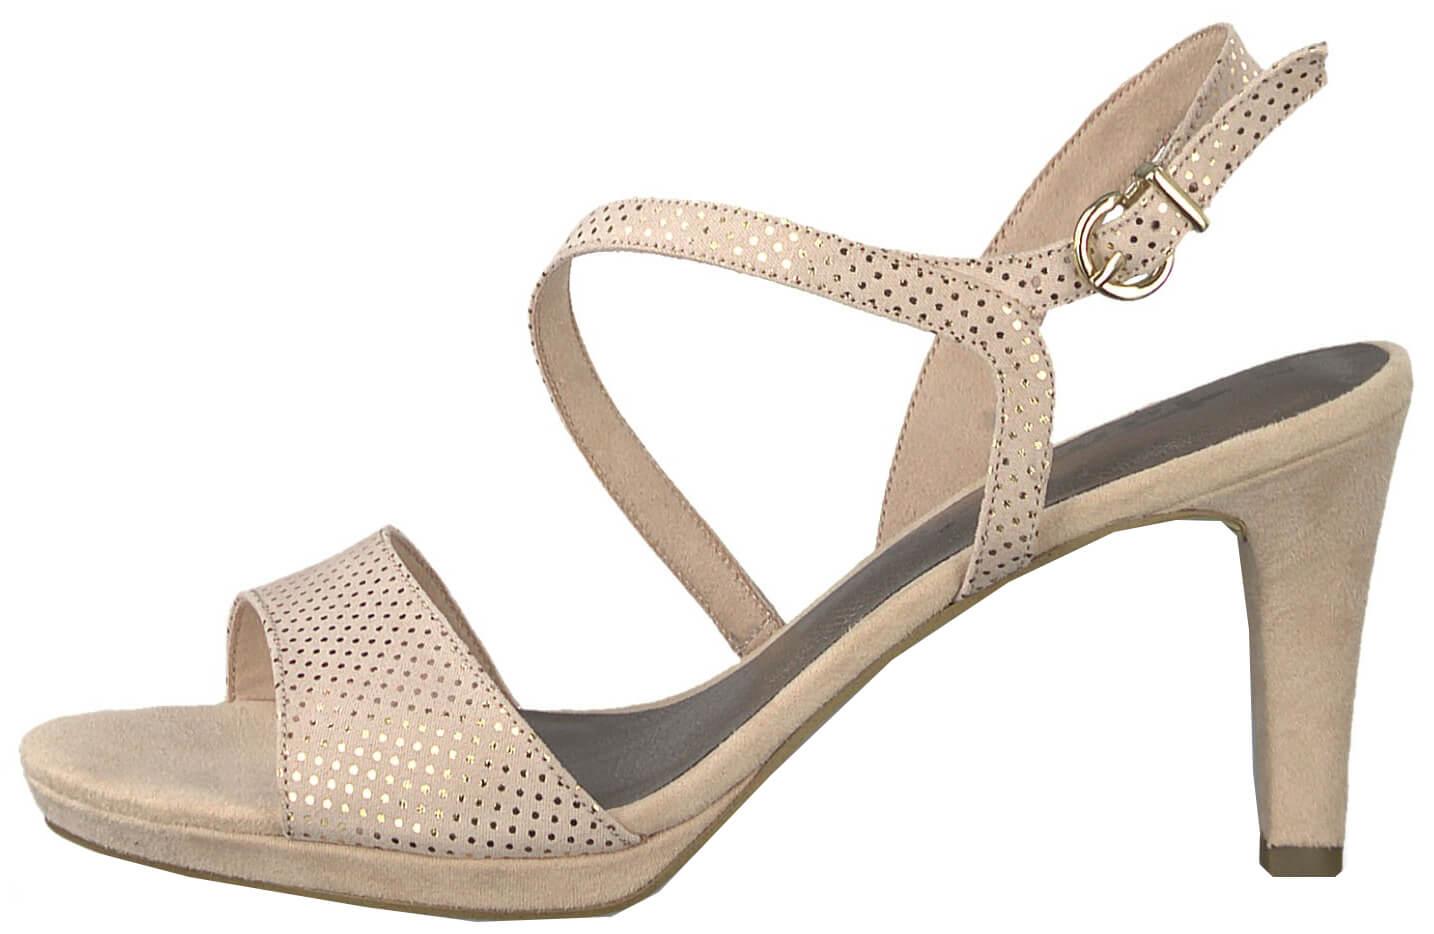 0080f445fd15 Tamaris Dámské sandále 1-1-28318-22-967 Rose Dots